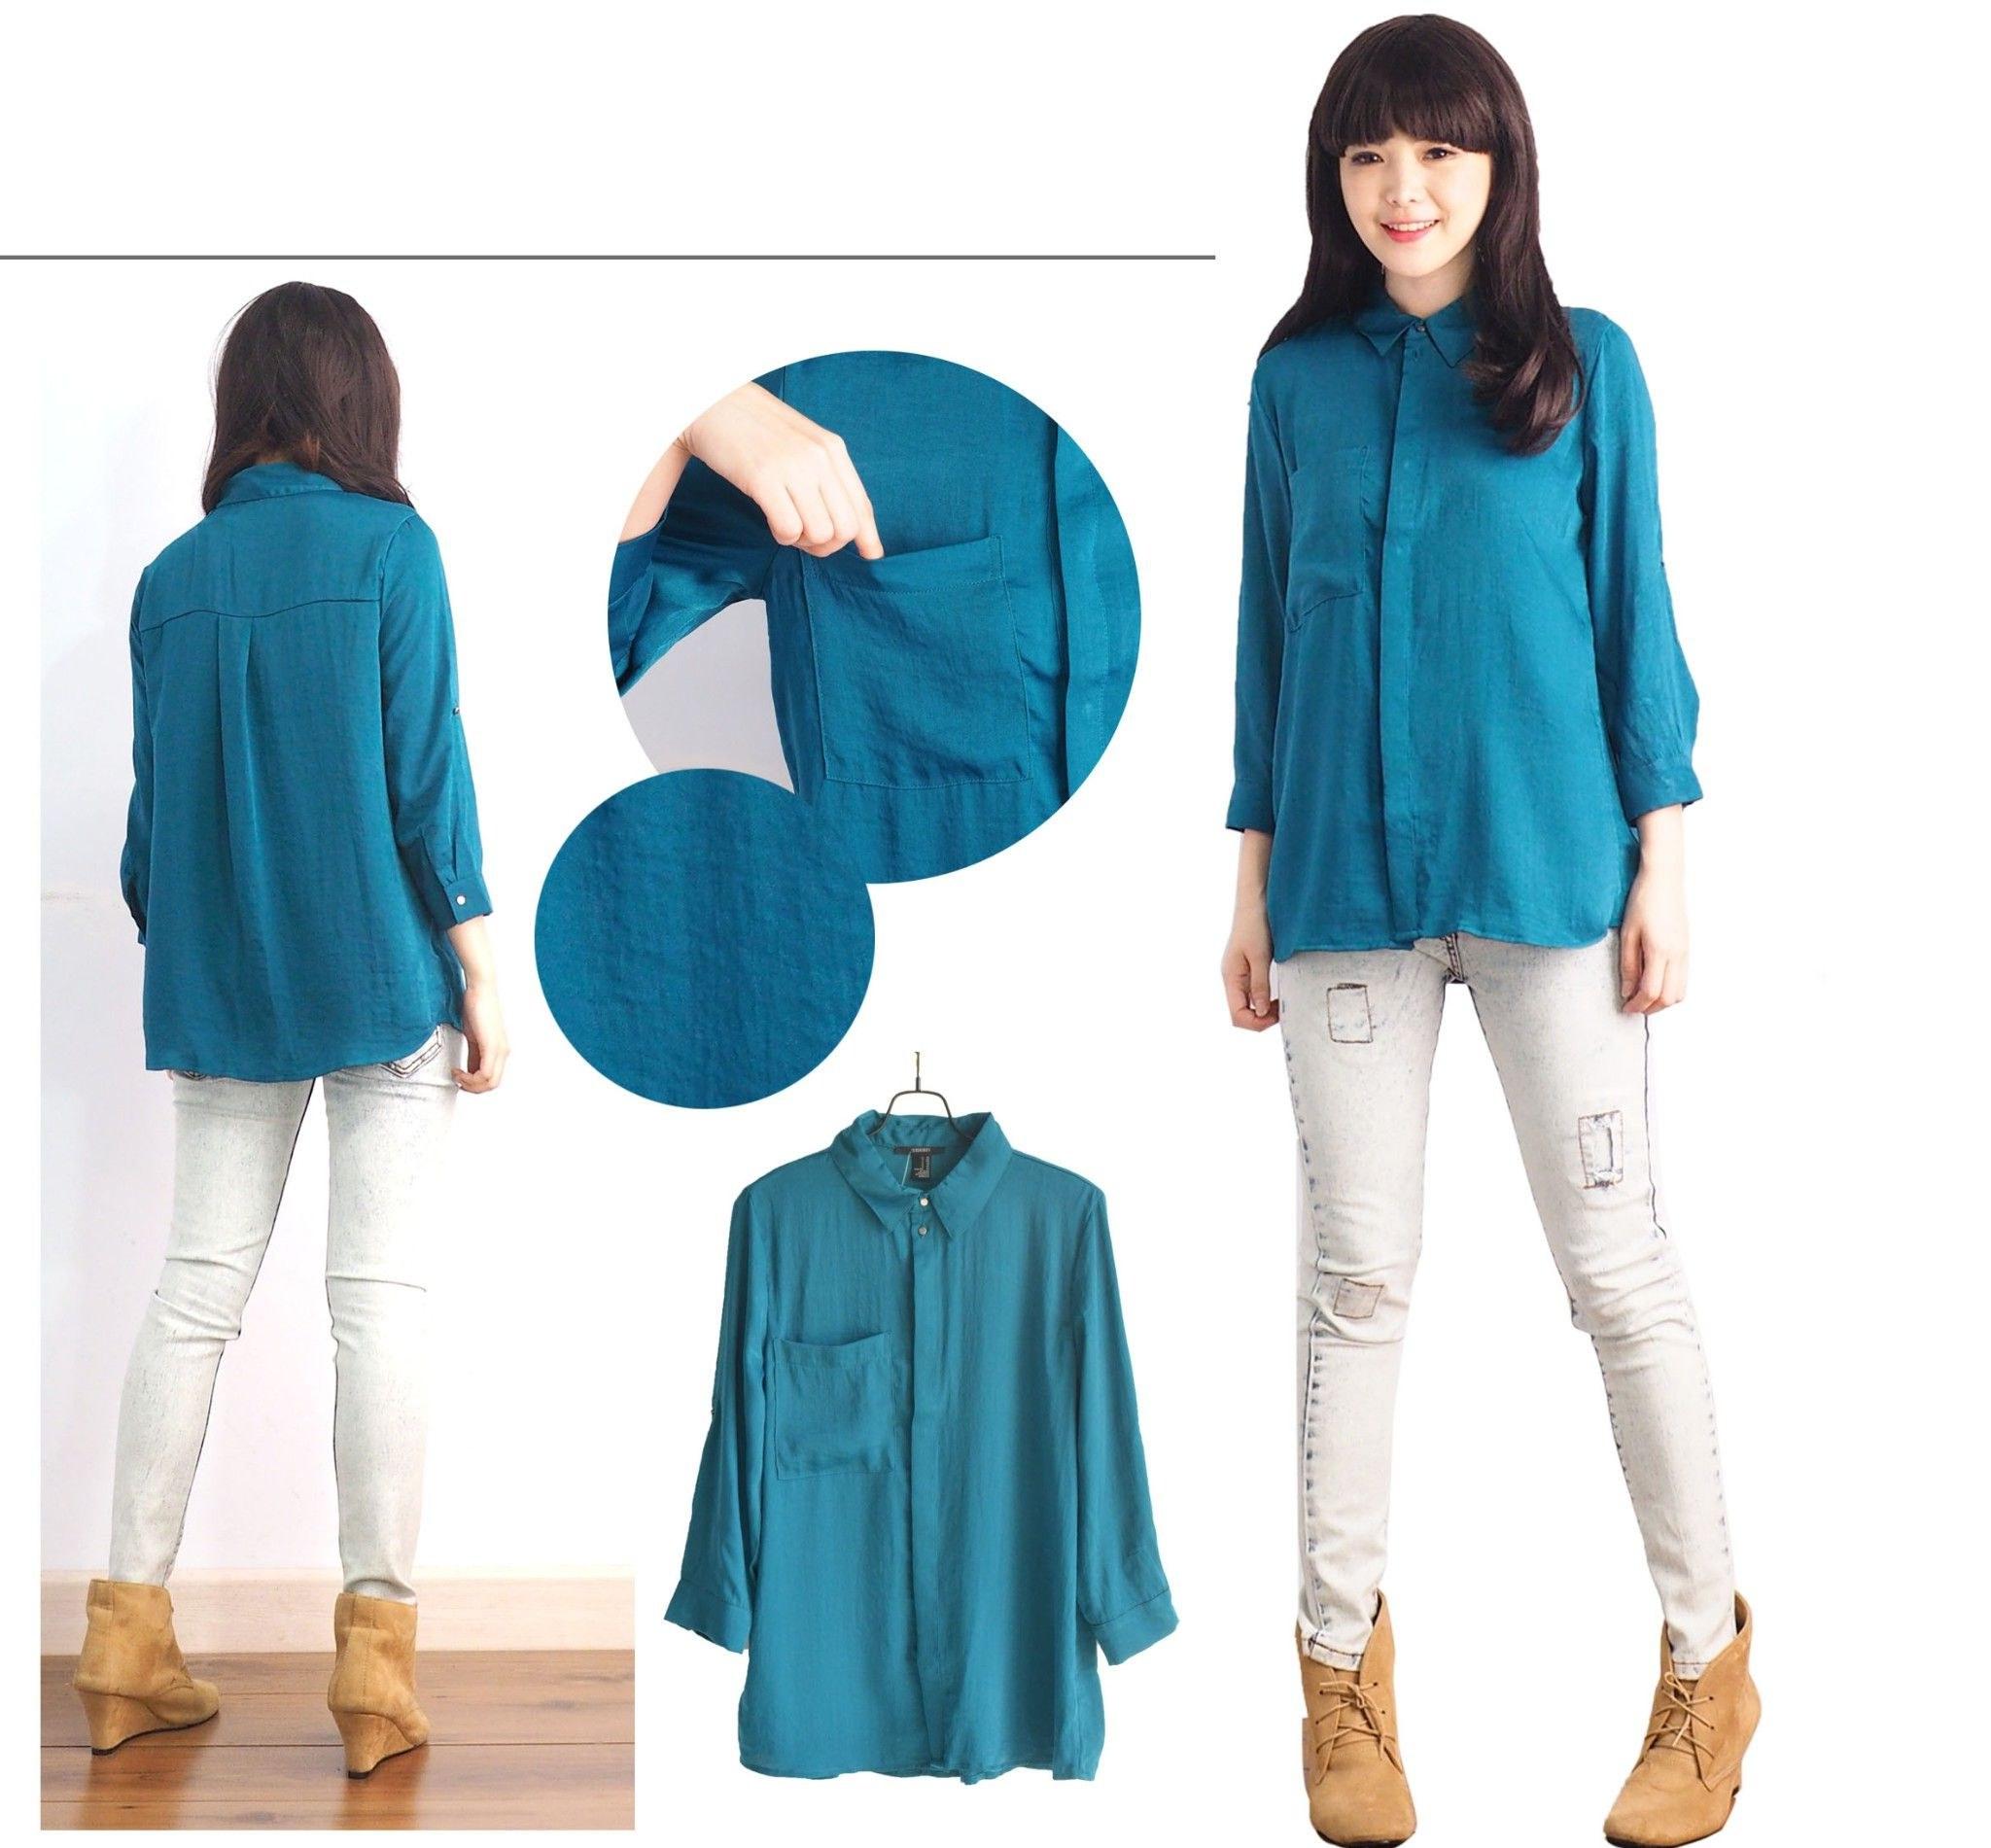 Ide Baju Lebaran Bayi Perempuan Y7du Blouse Muslim Model Pakaian Wanita Terbaru Pakaian Bayi